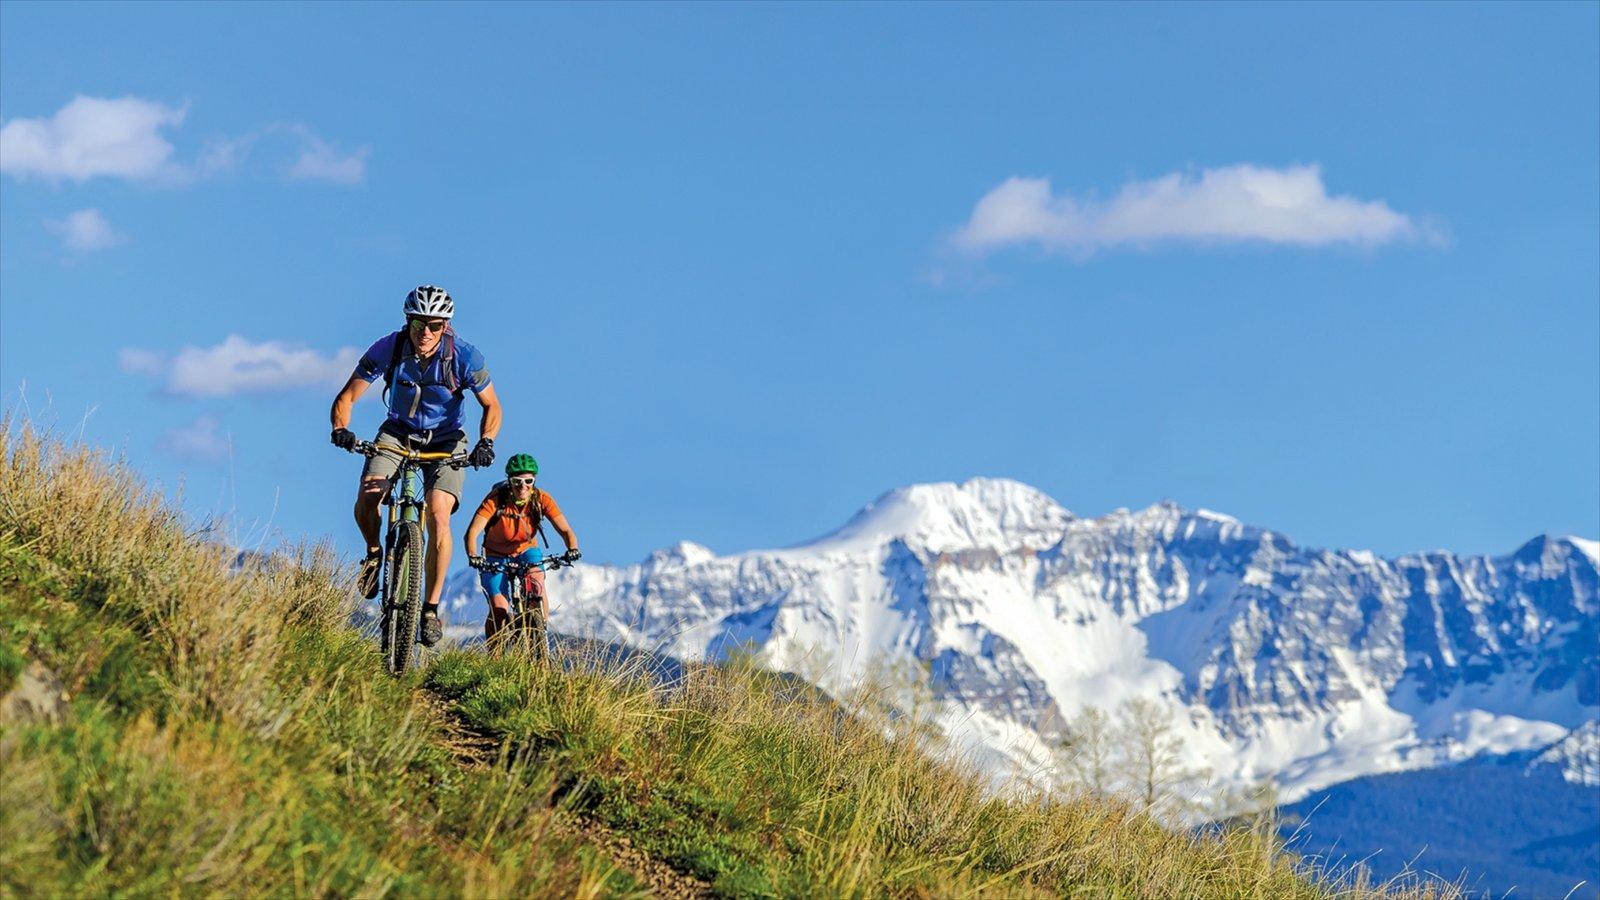 Telluride Ski Resort Which Includes Mountains Mountain Biking And Snow